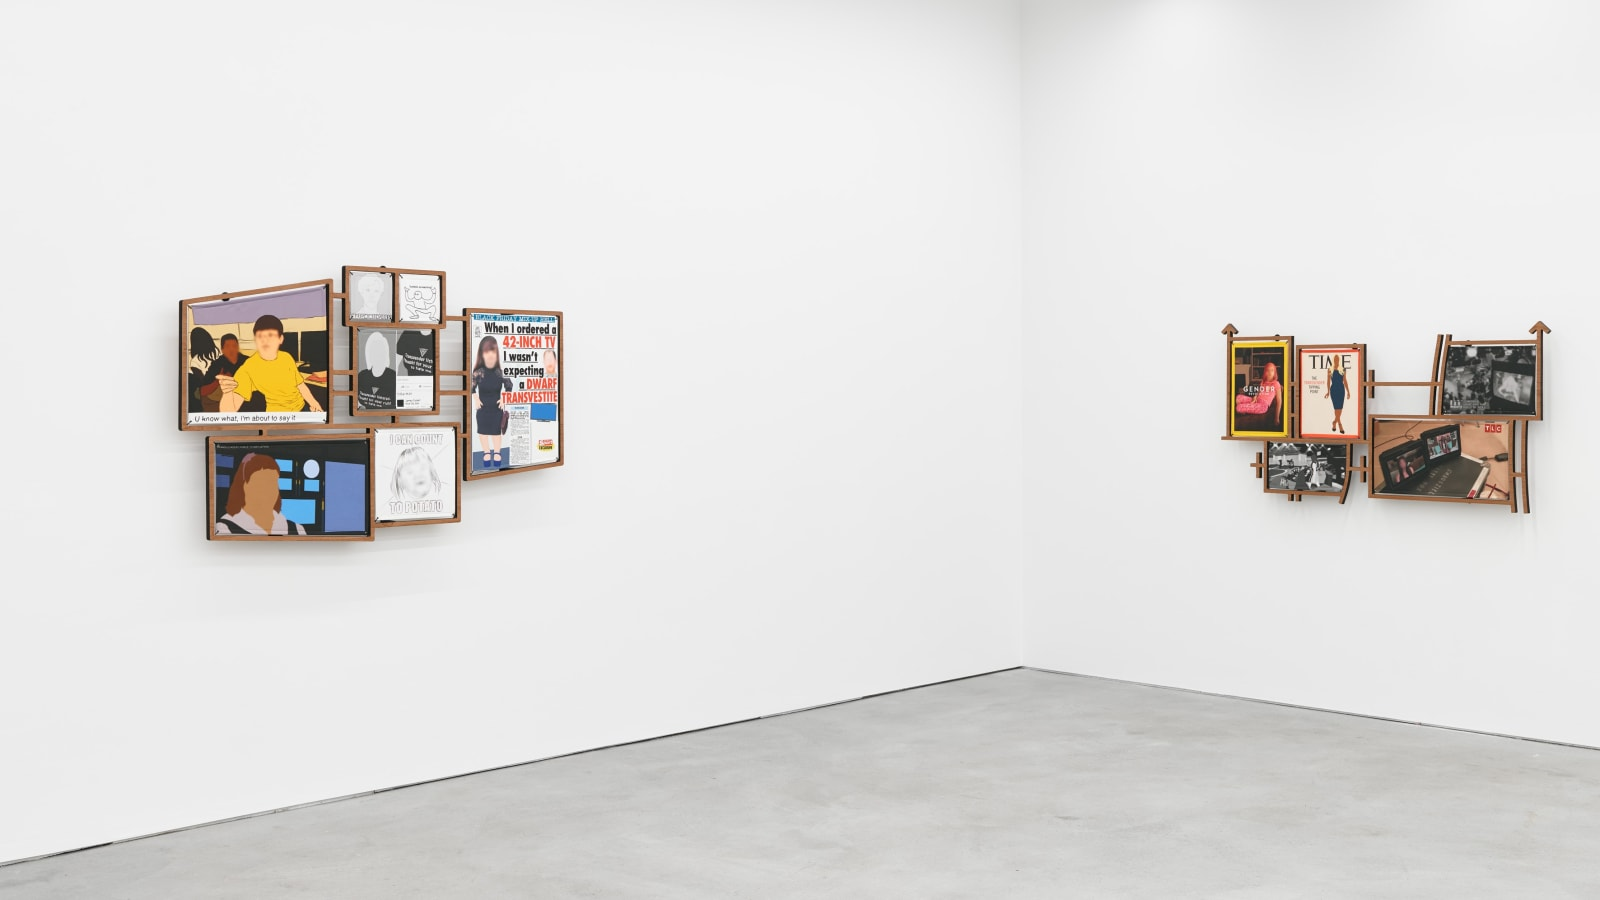 ANDREA CRESPO exhibition view, Step Right Up, Kraupa-Tuskany Zeidler, Berlin, 2019